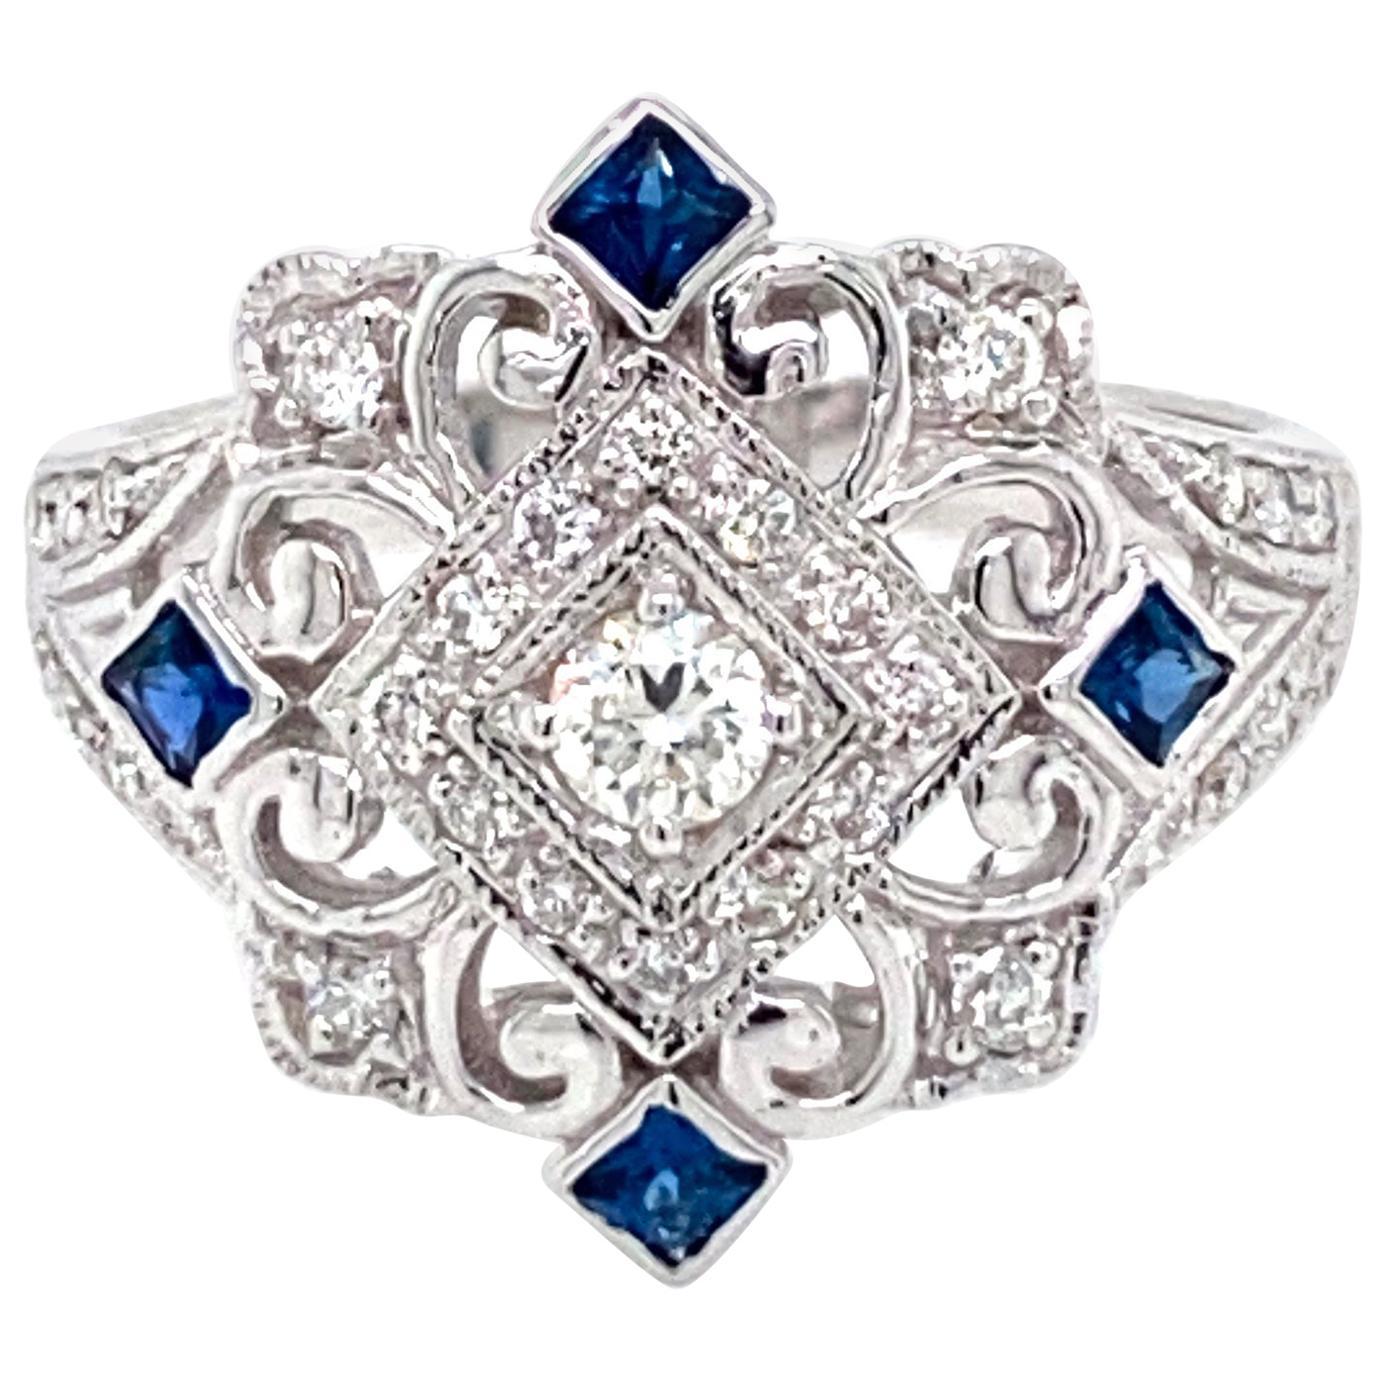 Art Deco Style Diamond Sapphire Cocktail Ring